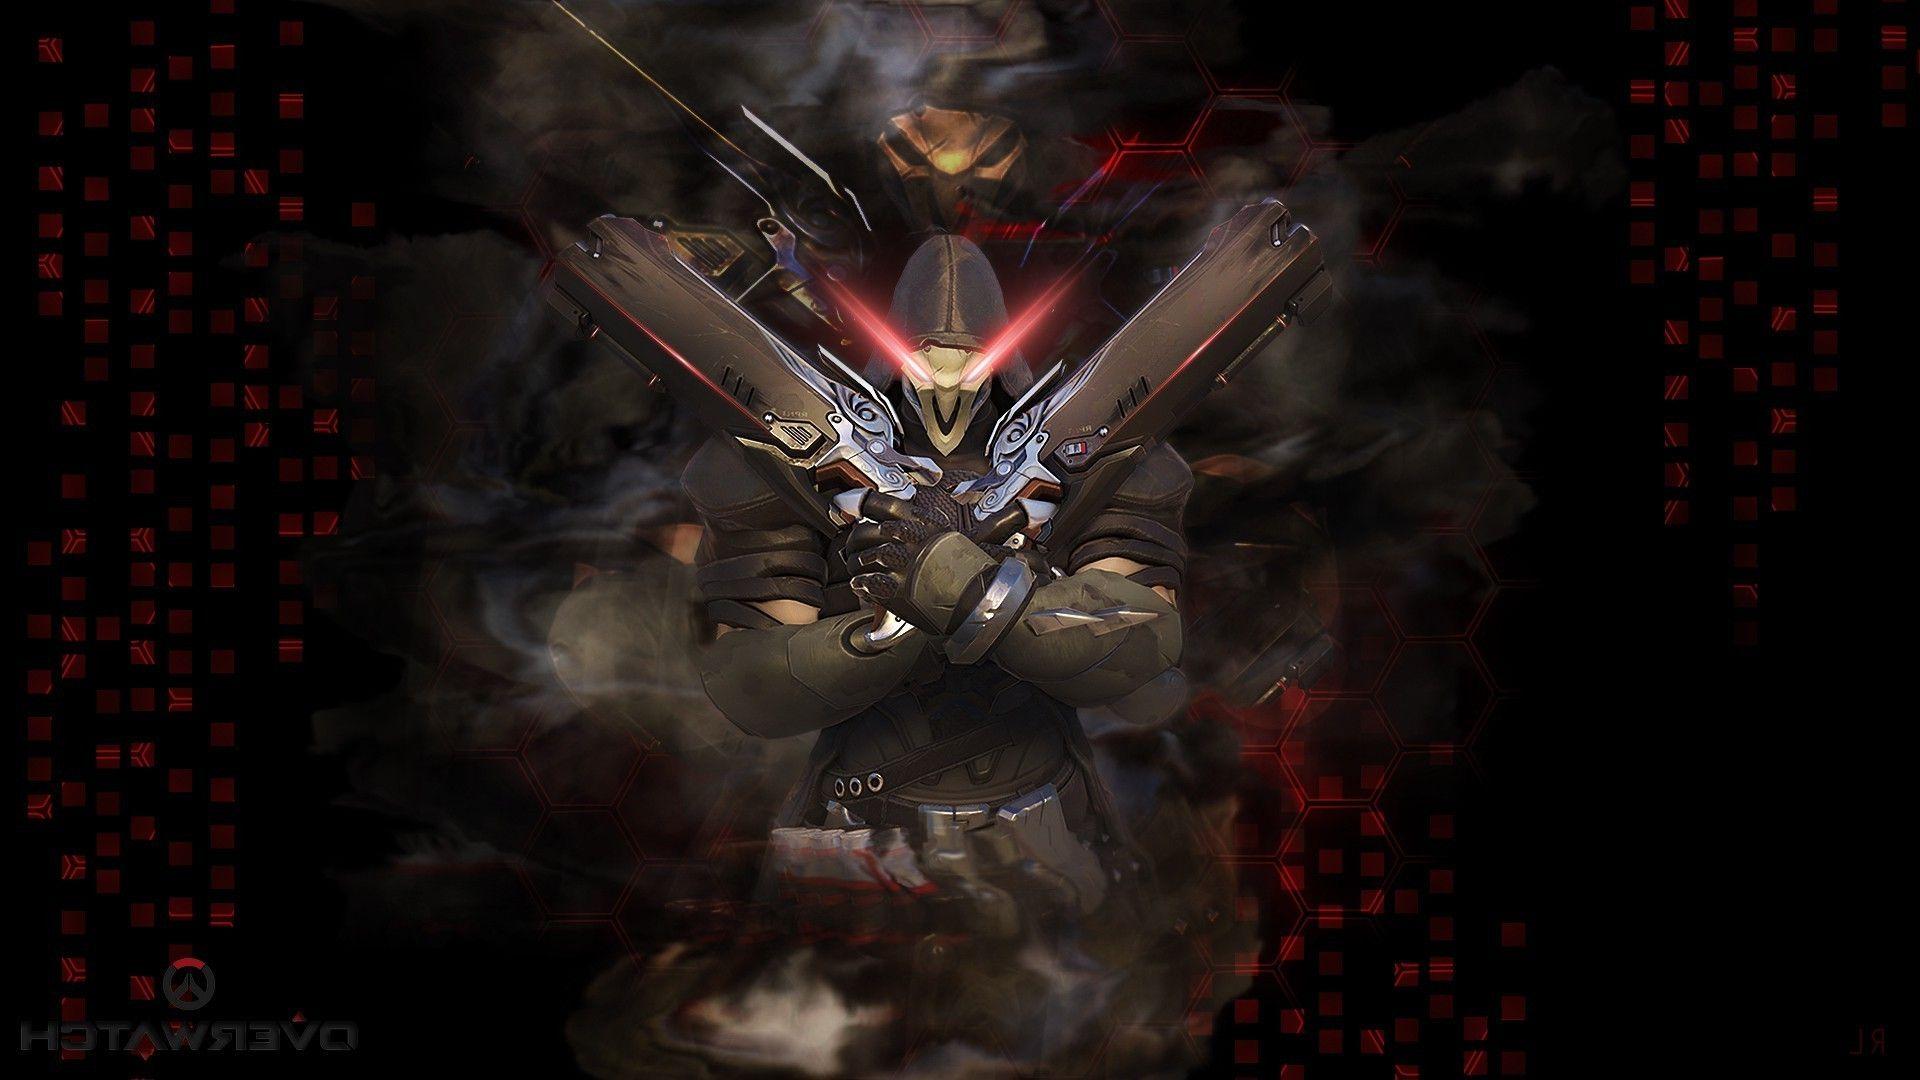 General 1920x1080 Blizzard Entertainment Overwatch Reaper